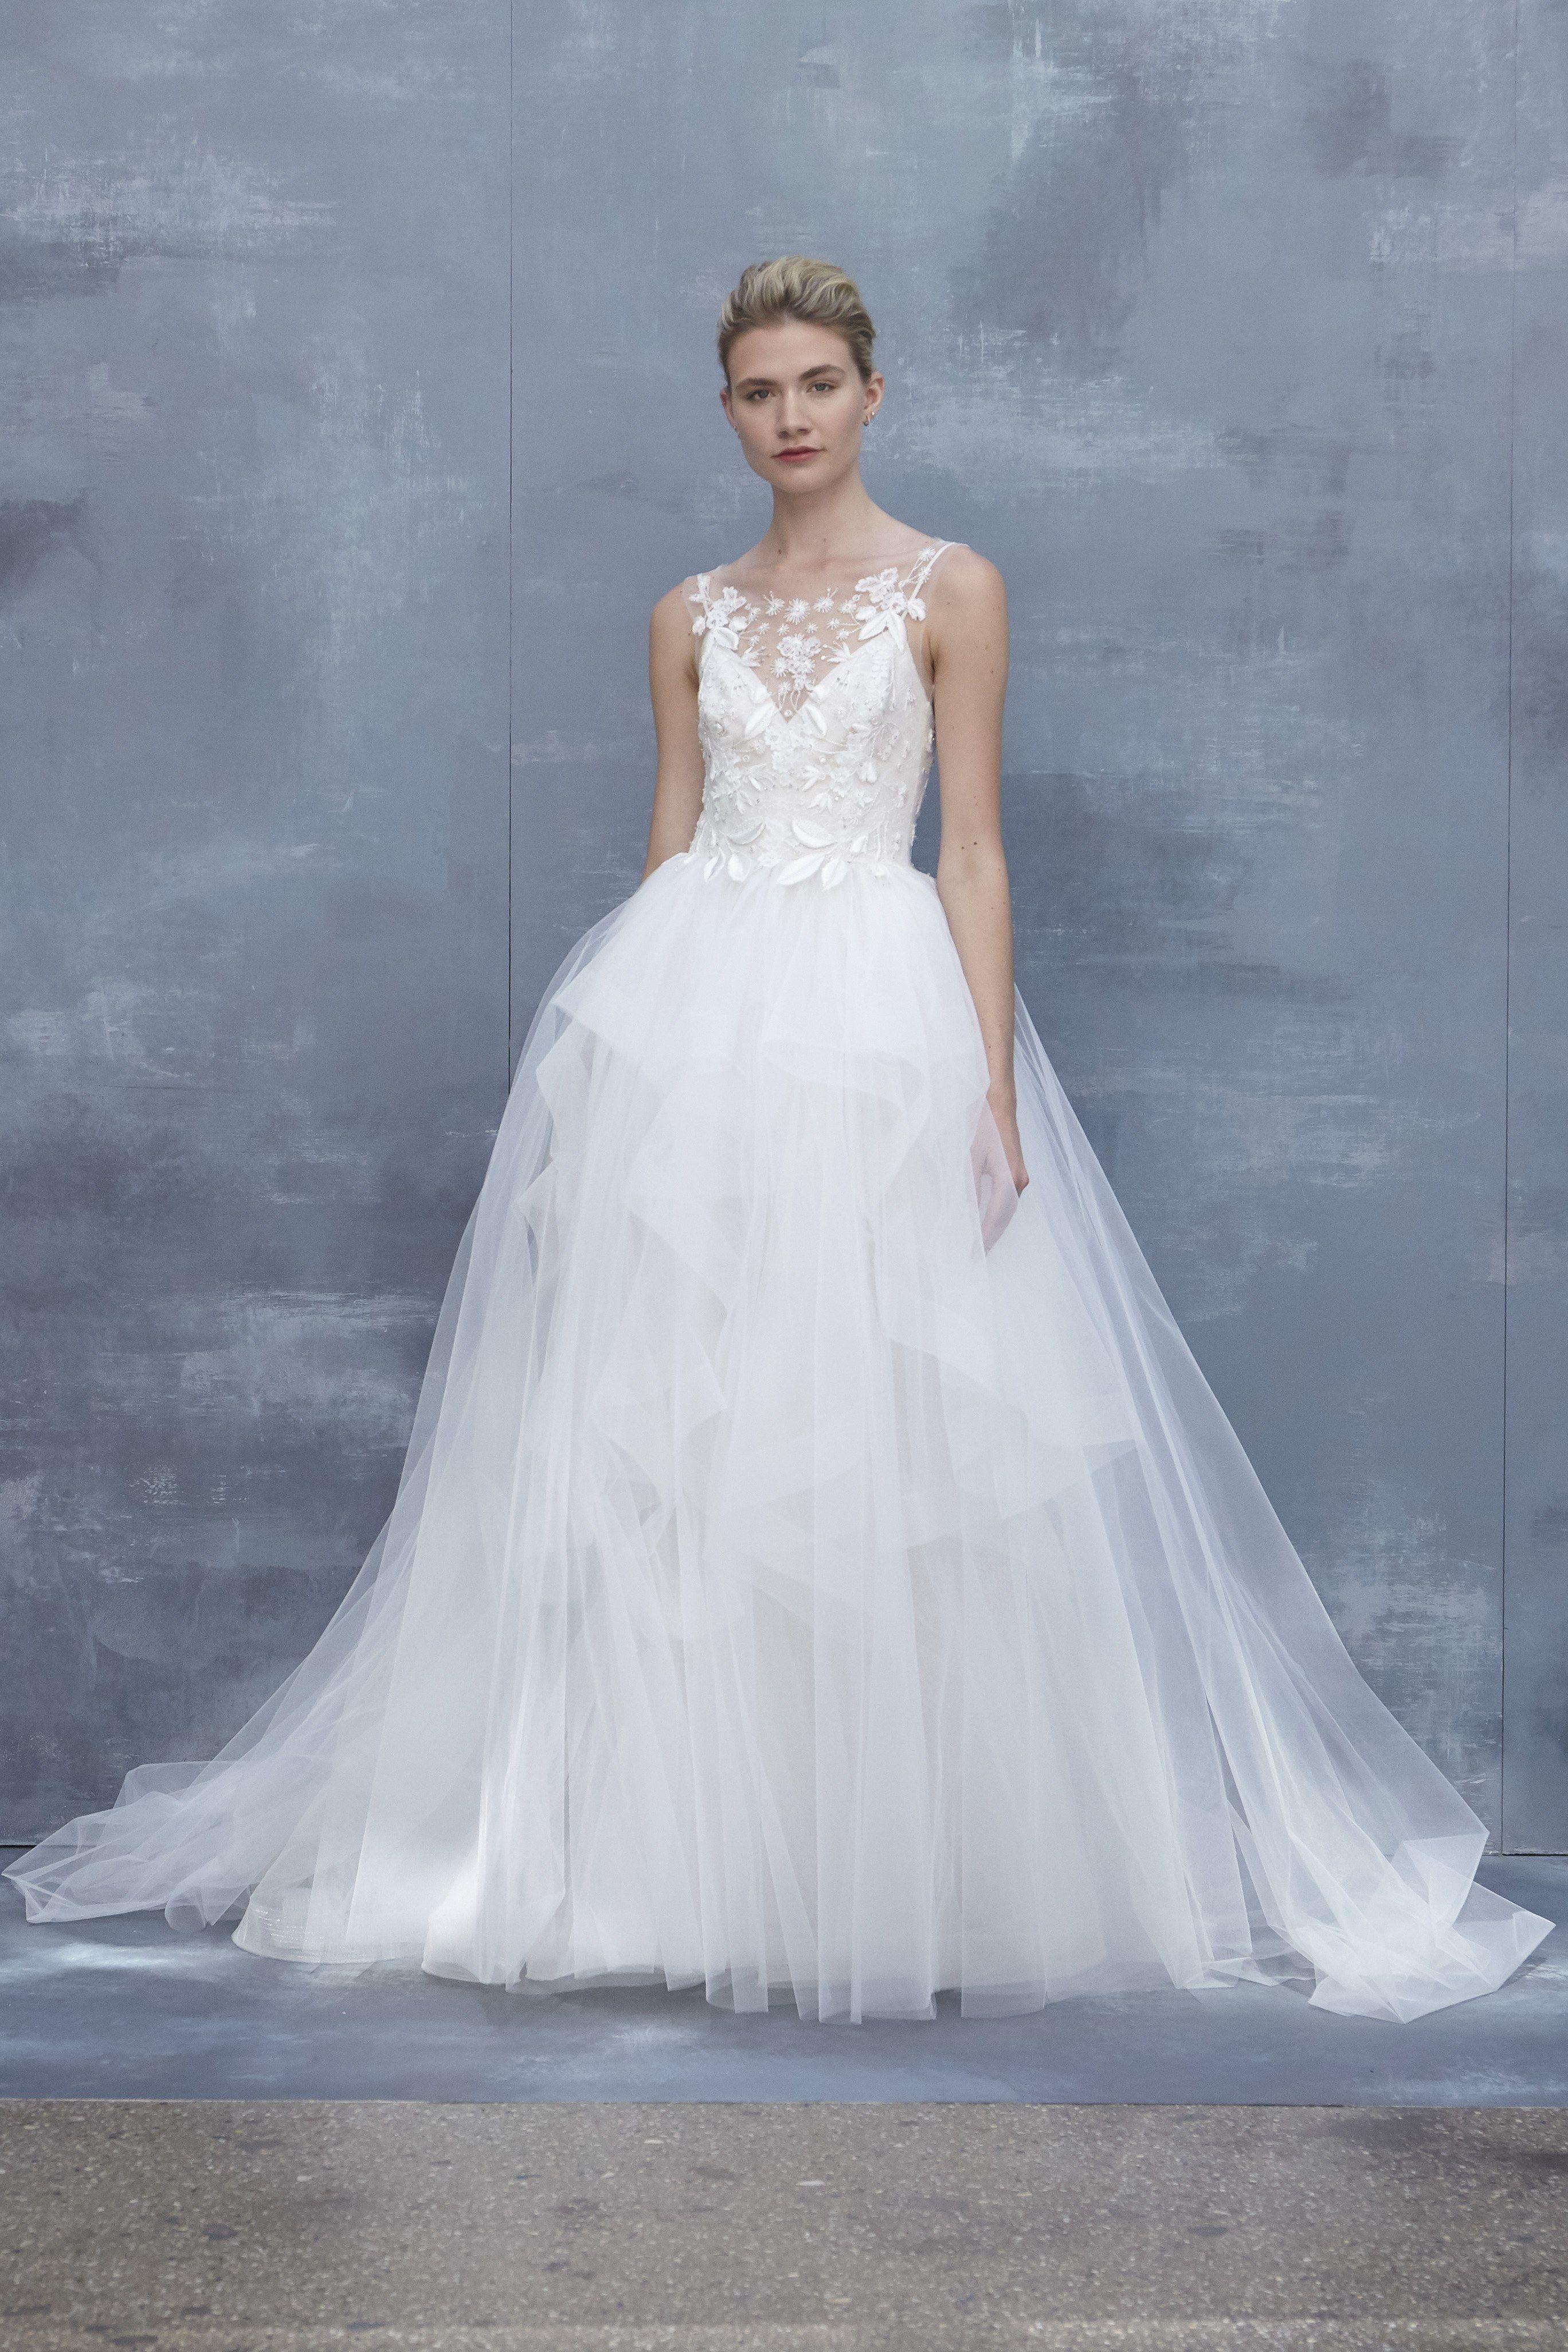 04a5b81a340 Amsale Bridal   Wedding Dress Collection Fall 2018